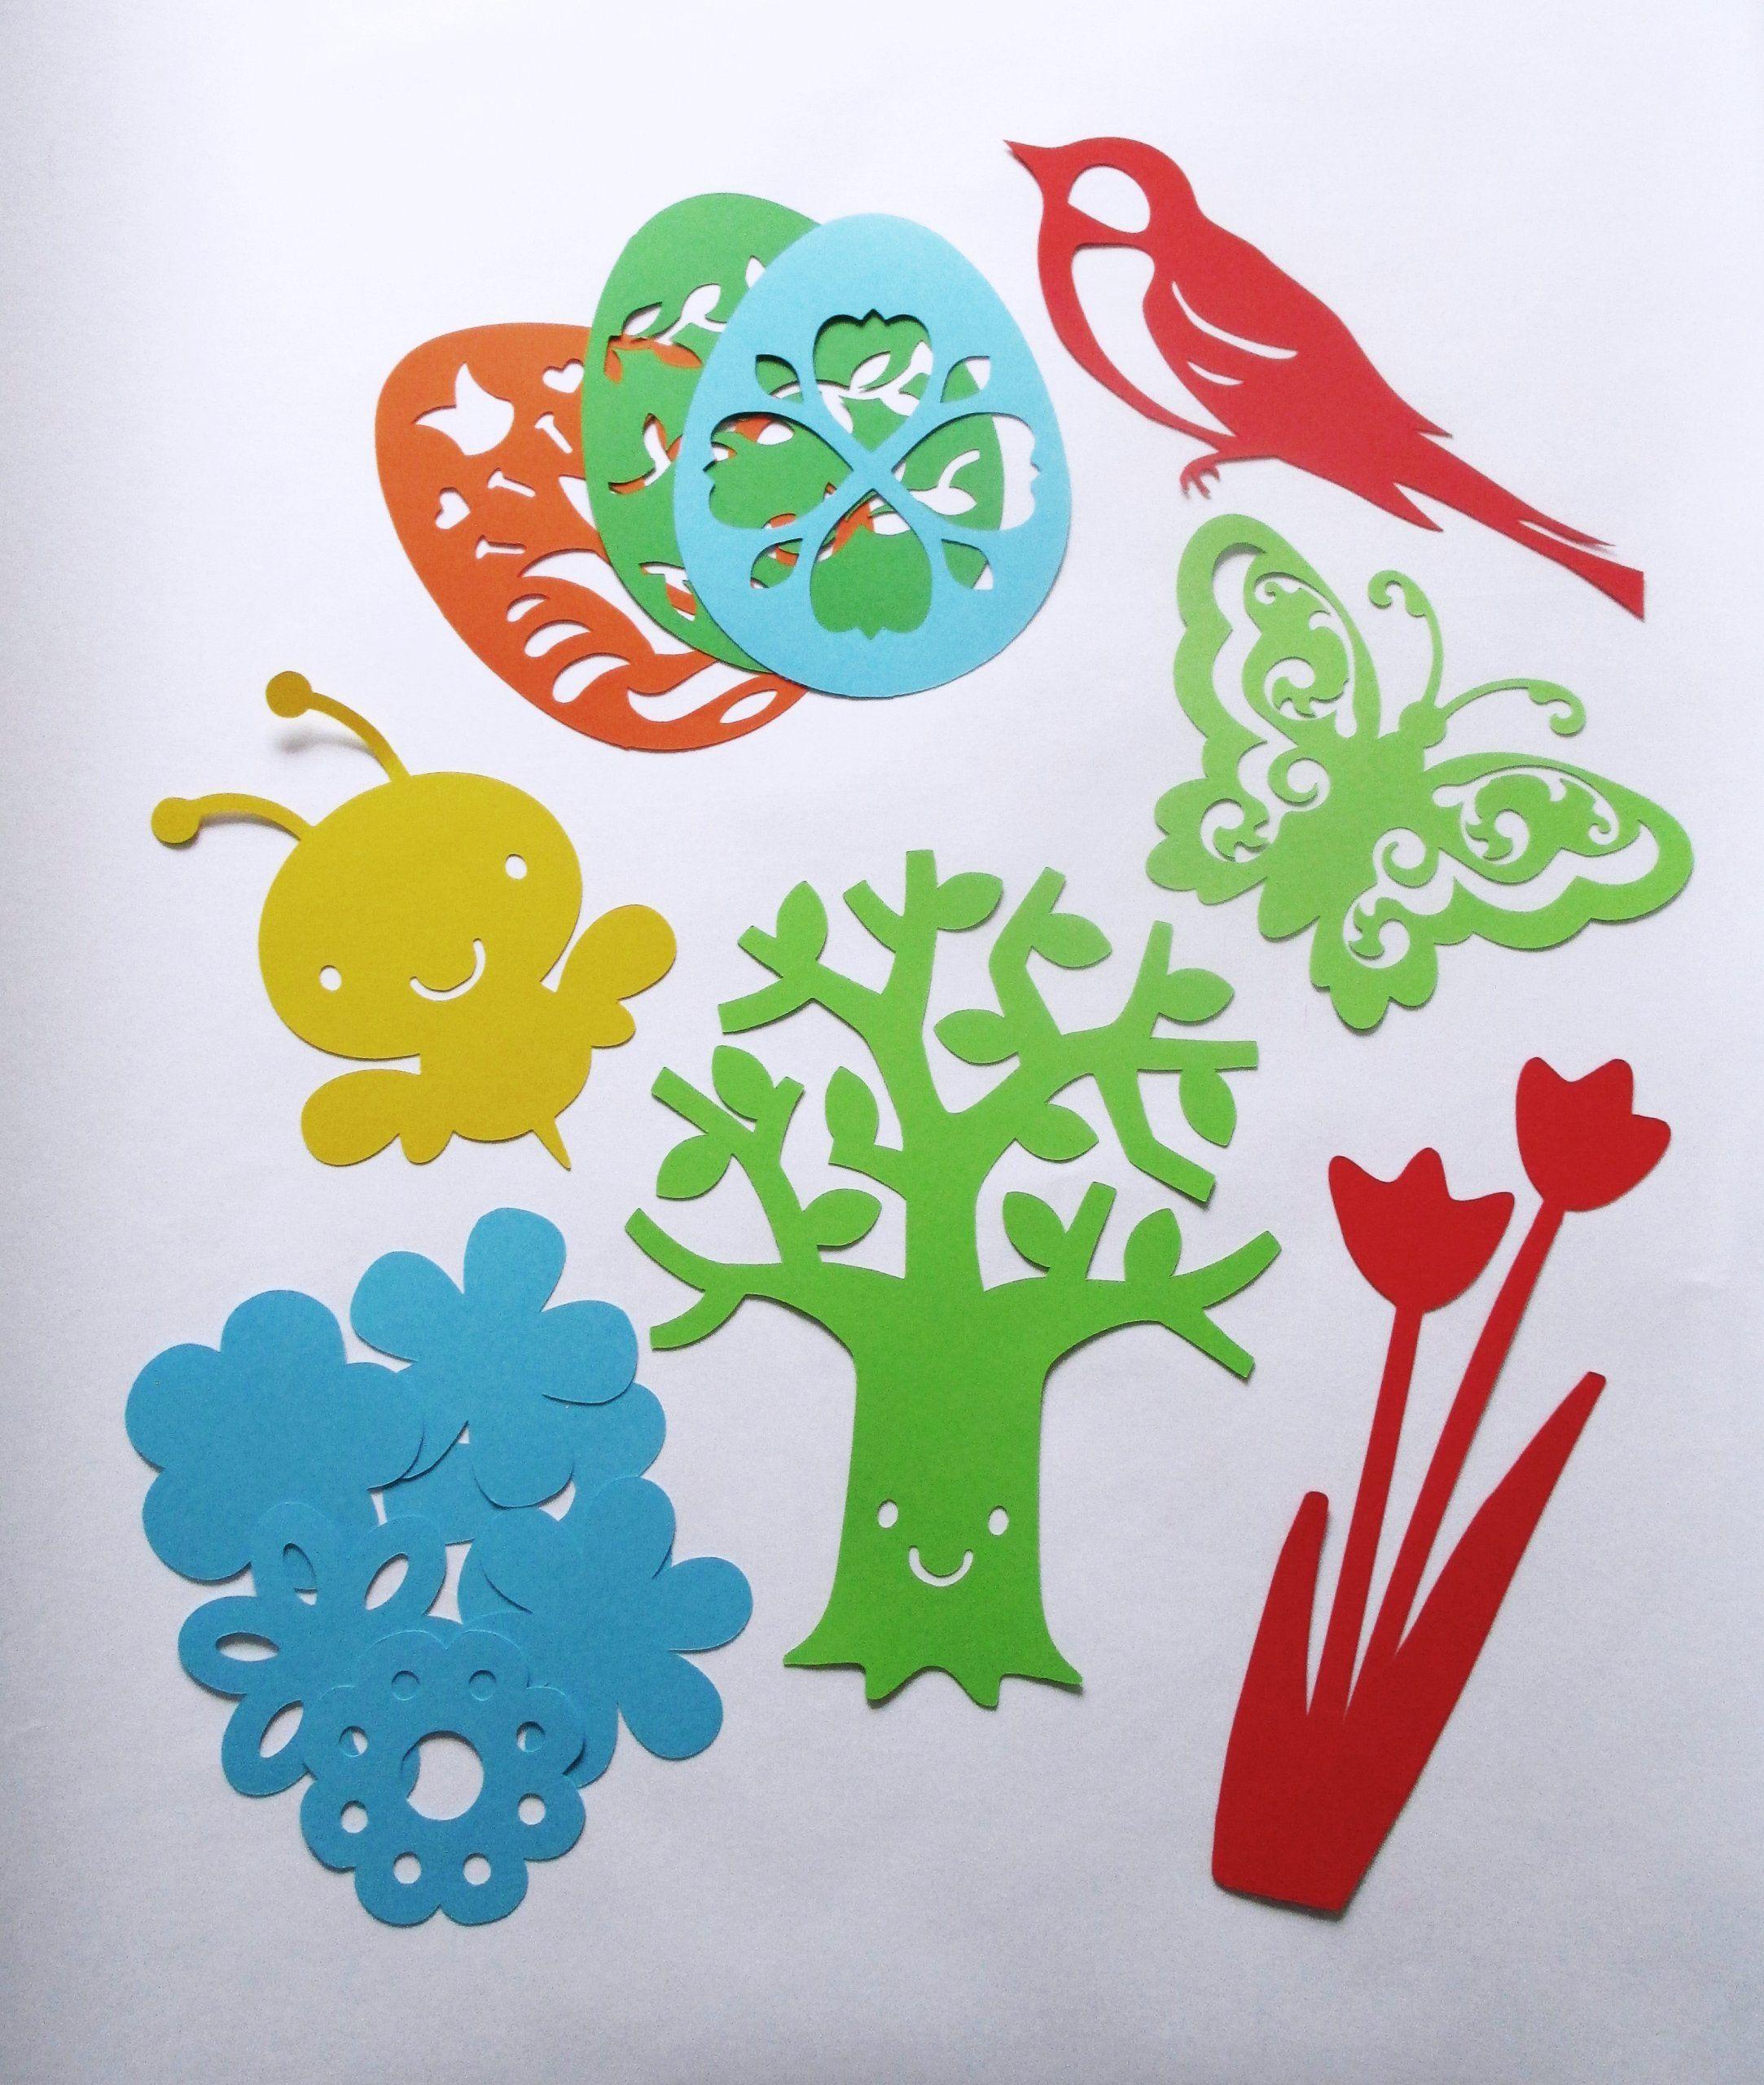 Kup Teraz Na Allegro Pl Za 5 00 Zl Dekoracje Wycinanki Witraze Na Okna W Klasie 7524389057 Allegro Pl Radosc Zaku Paper Crafts Diy Paper Crafts Crafts